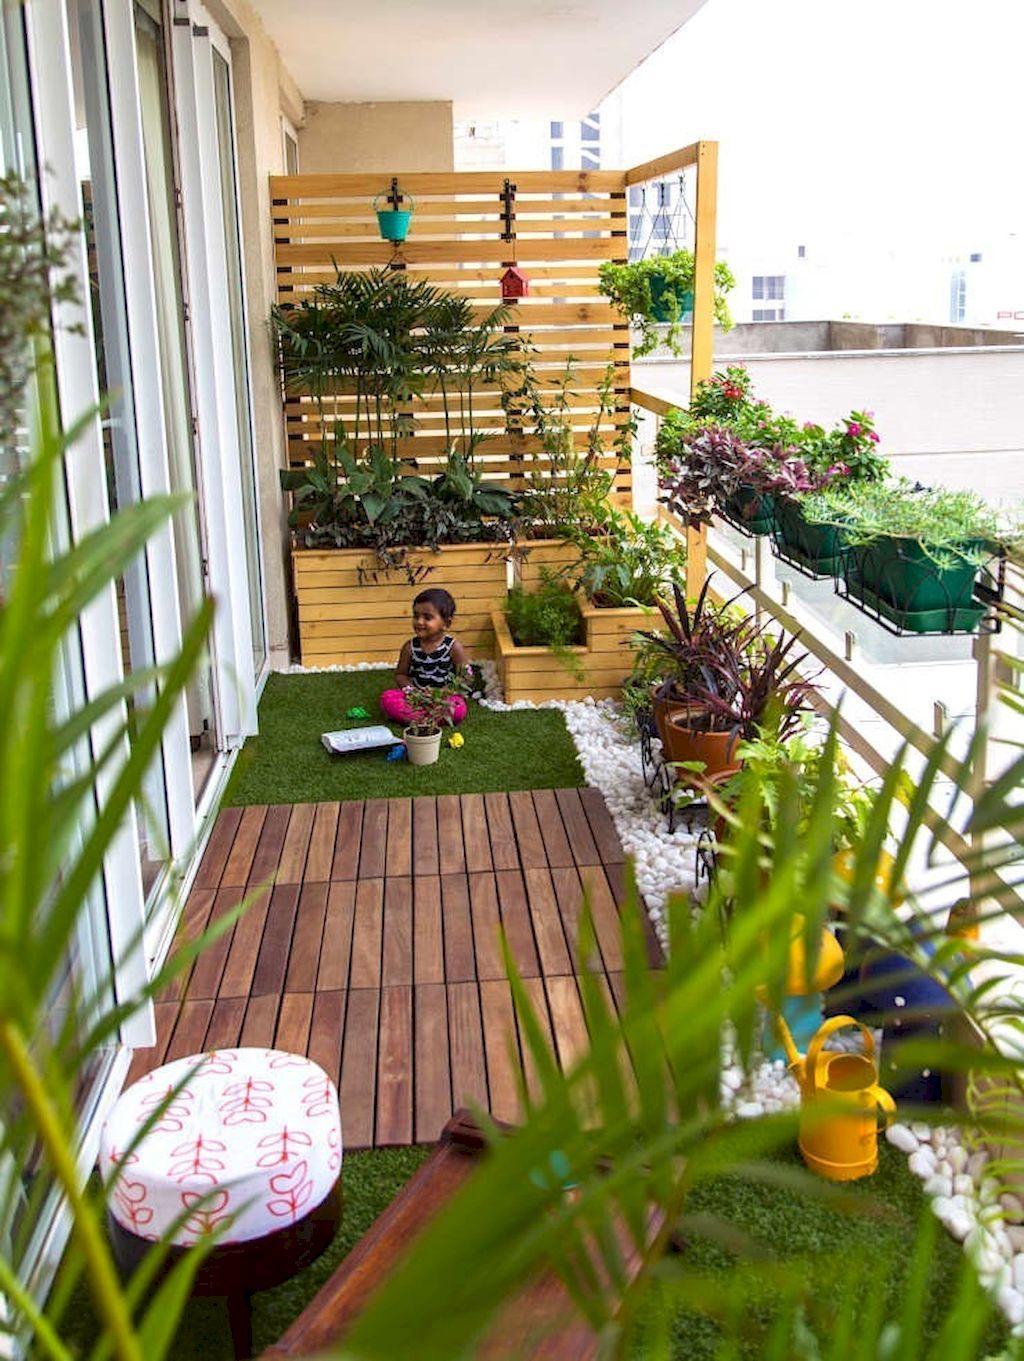 40 Apartment Balcony Decorating Ideas On A Budget Small Balcony